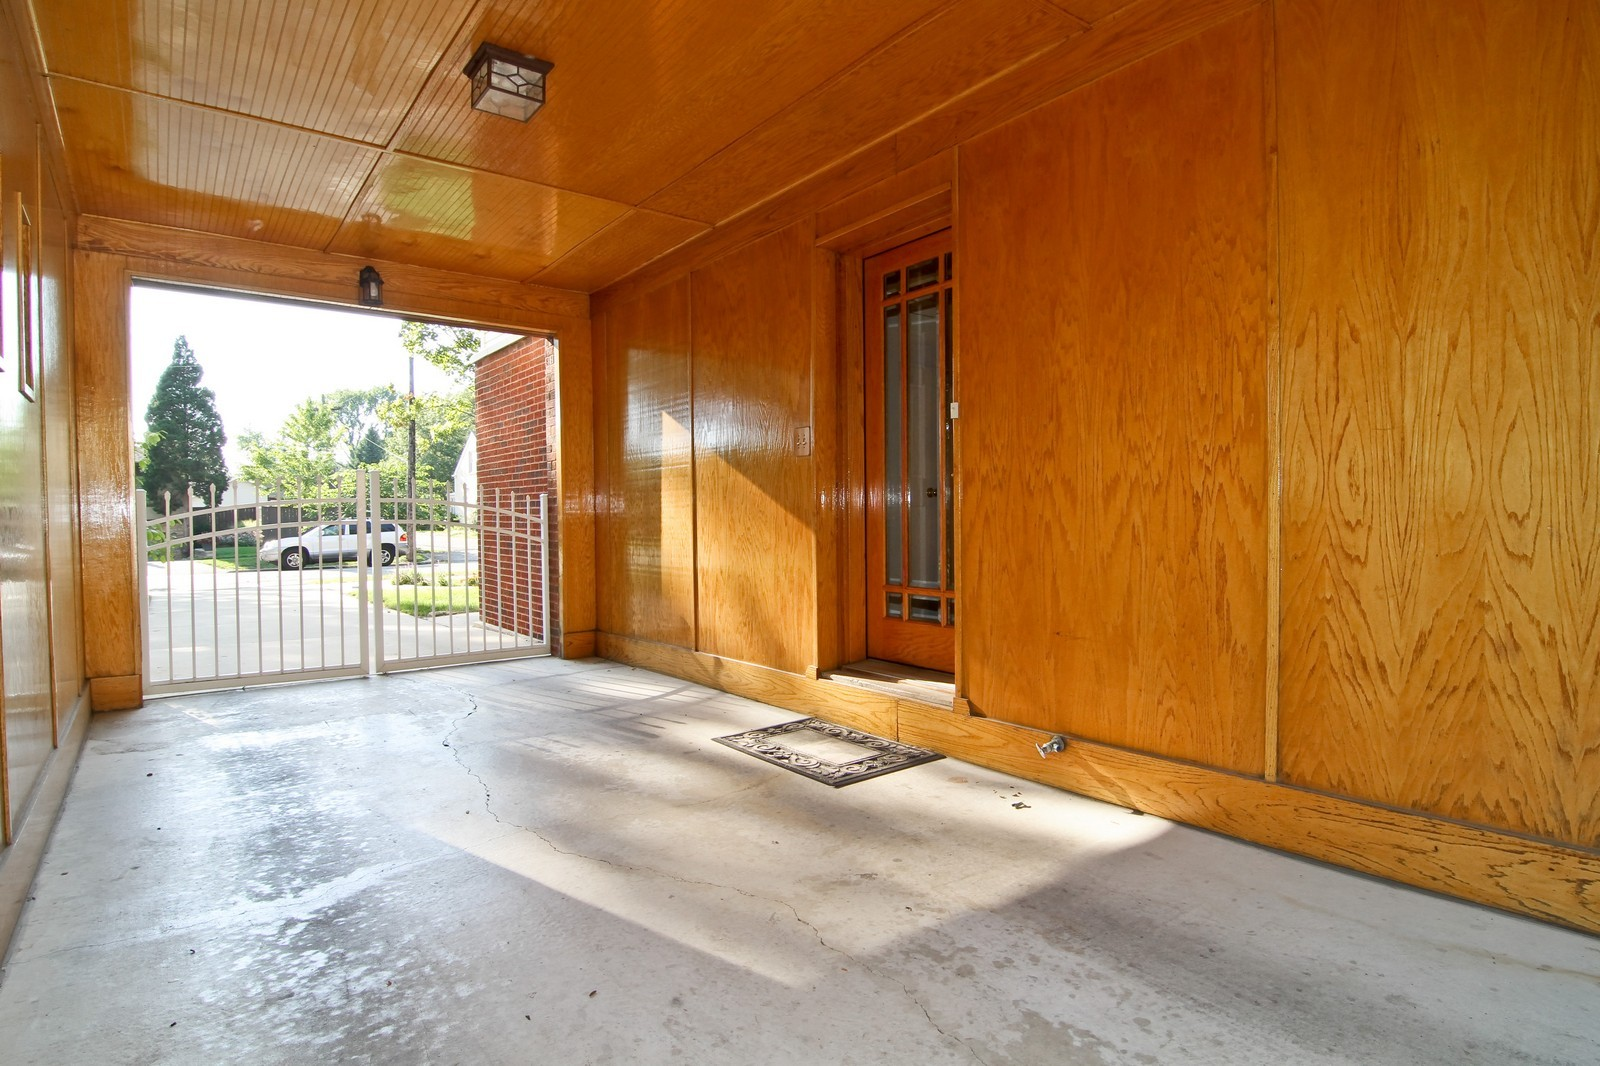 Real Estate Photography - 441 Edgewood Dr, La Grange, IL, 60525 - Side View